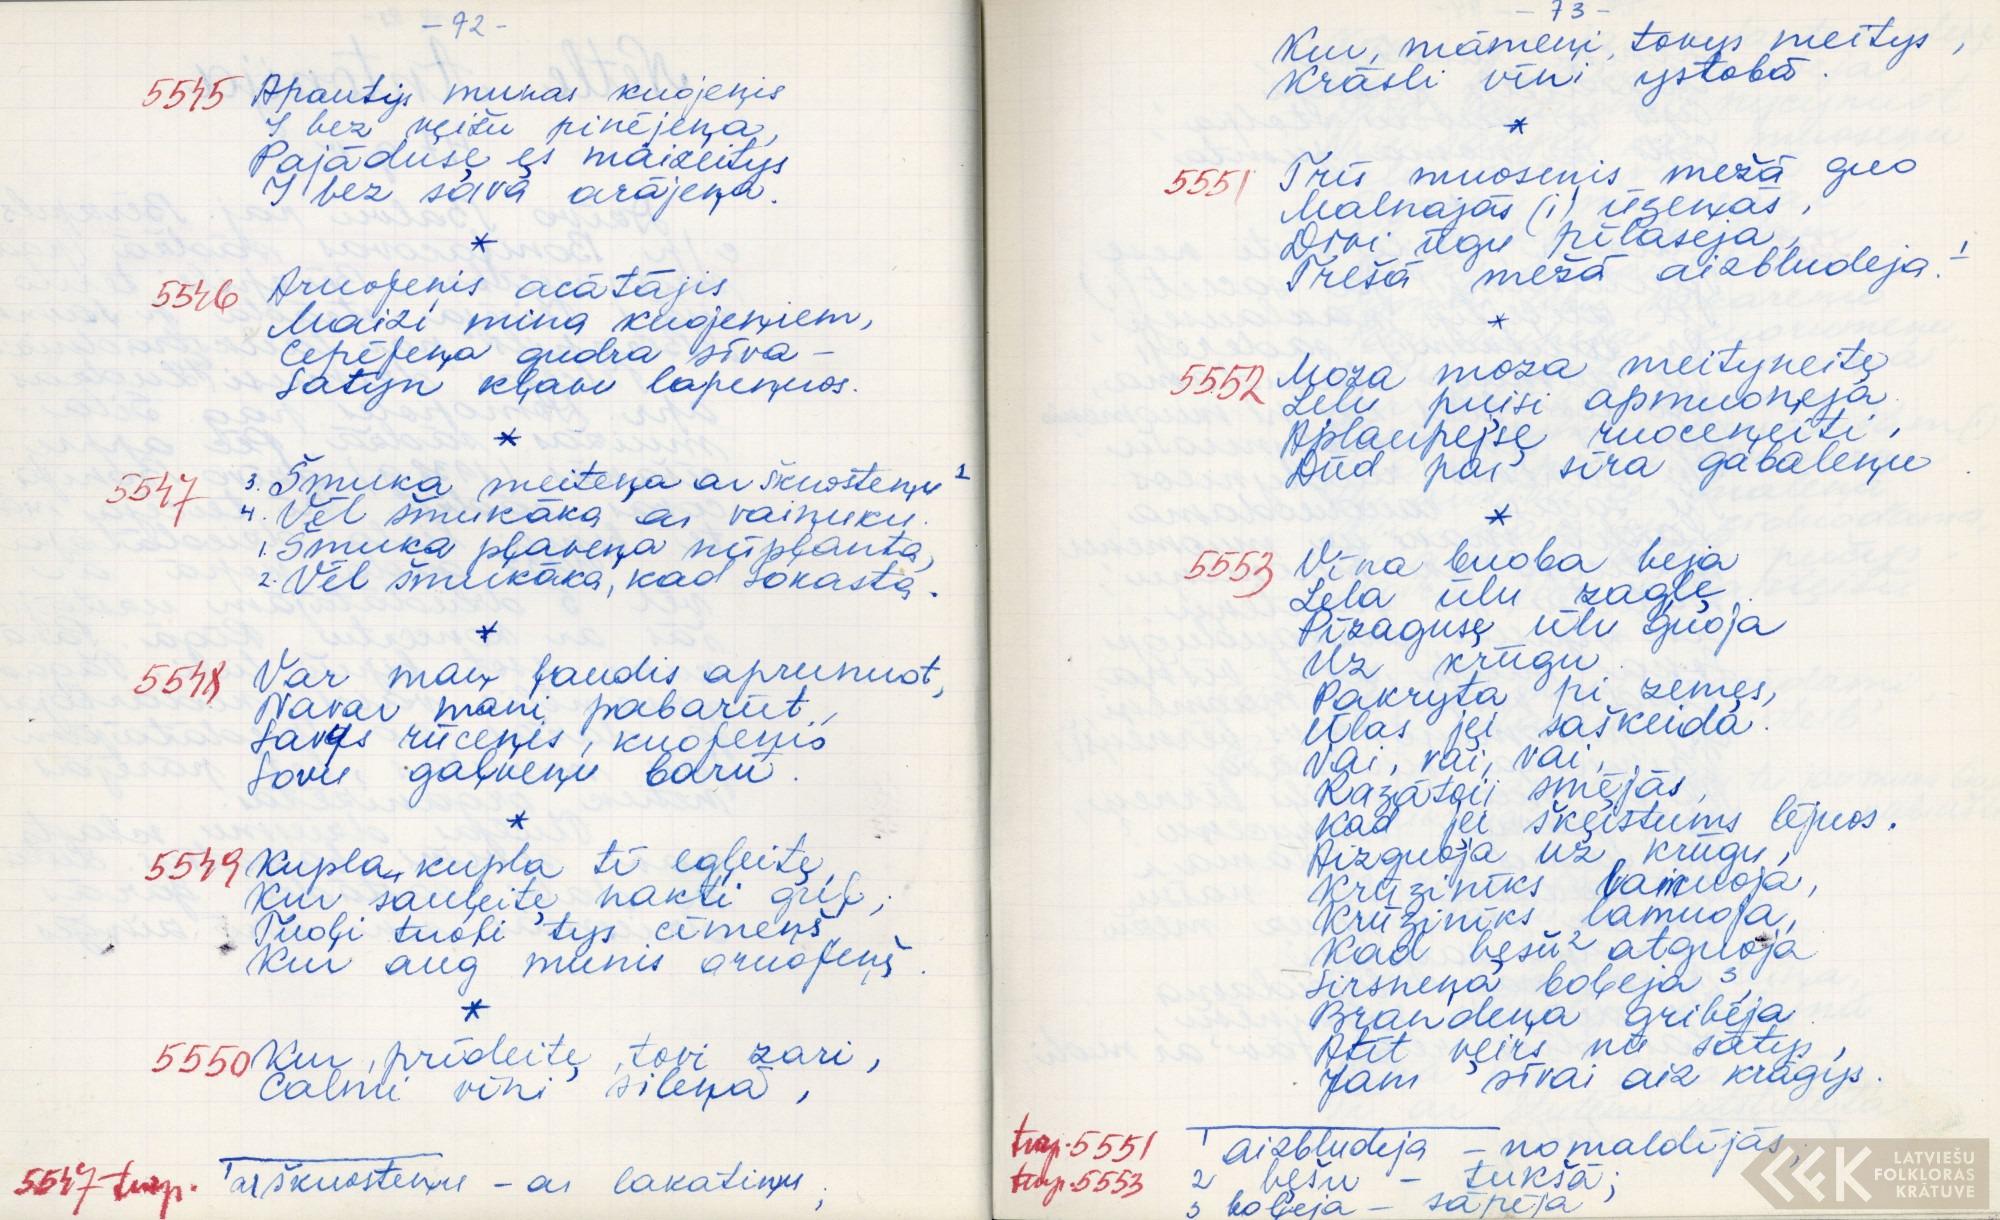 1950-14-zinatniska-ekspedicija-14-0040